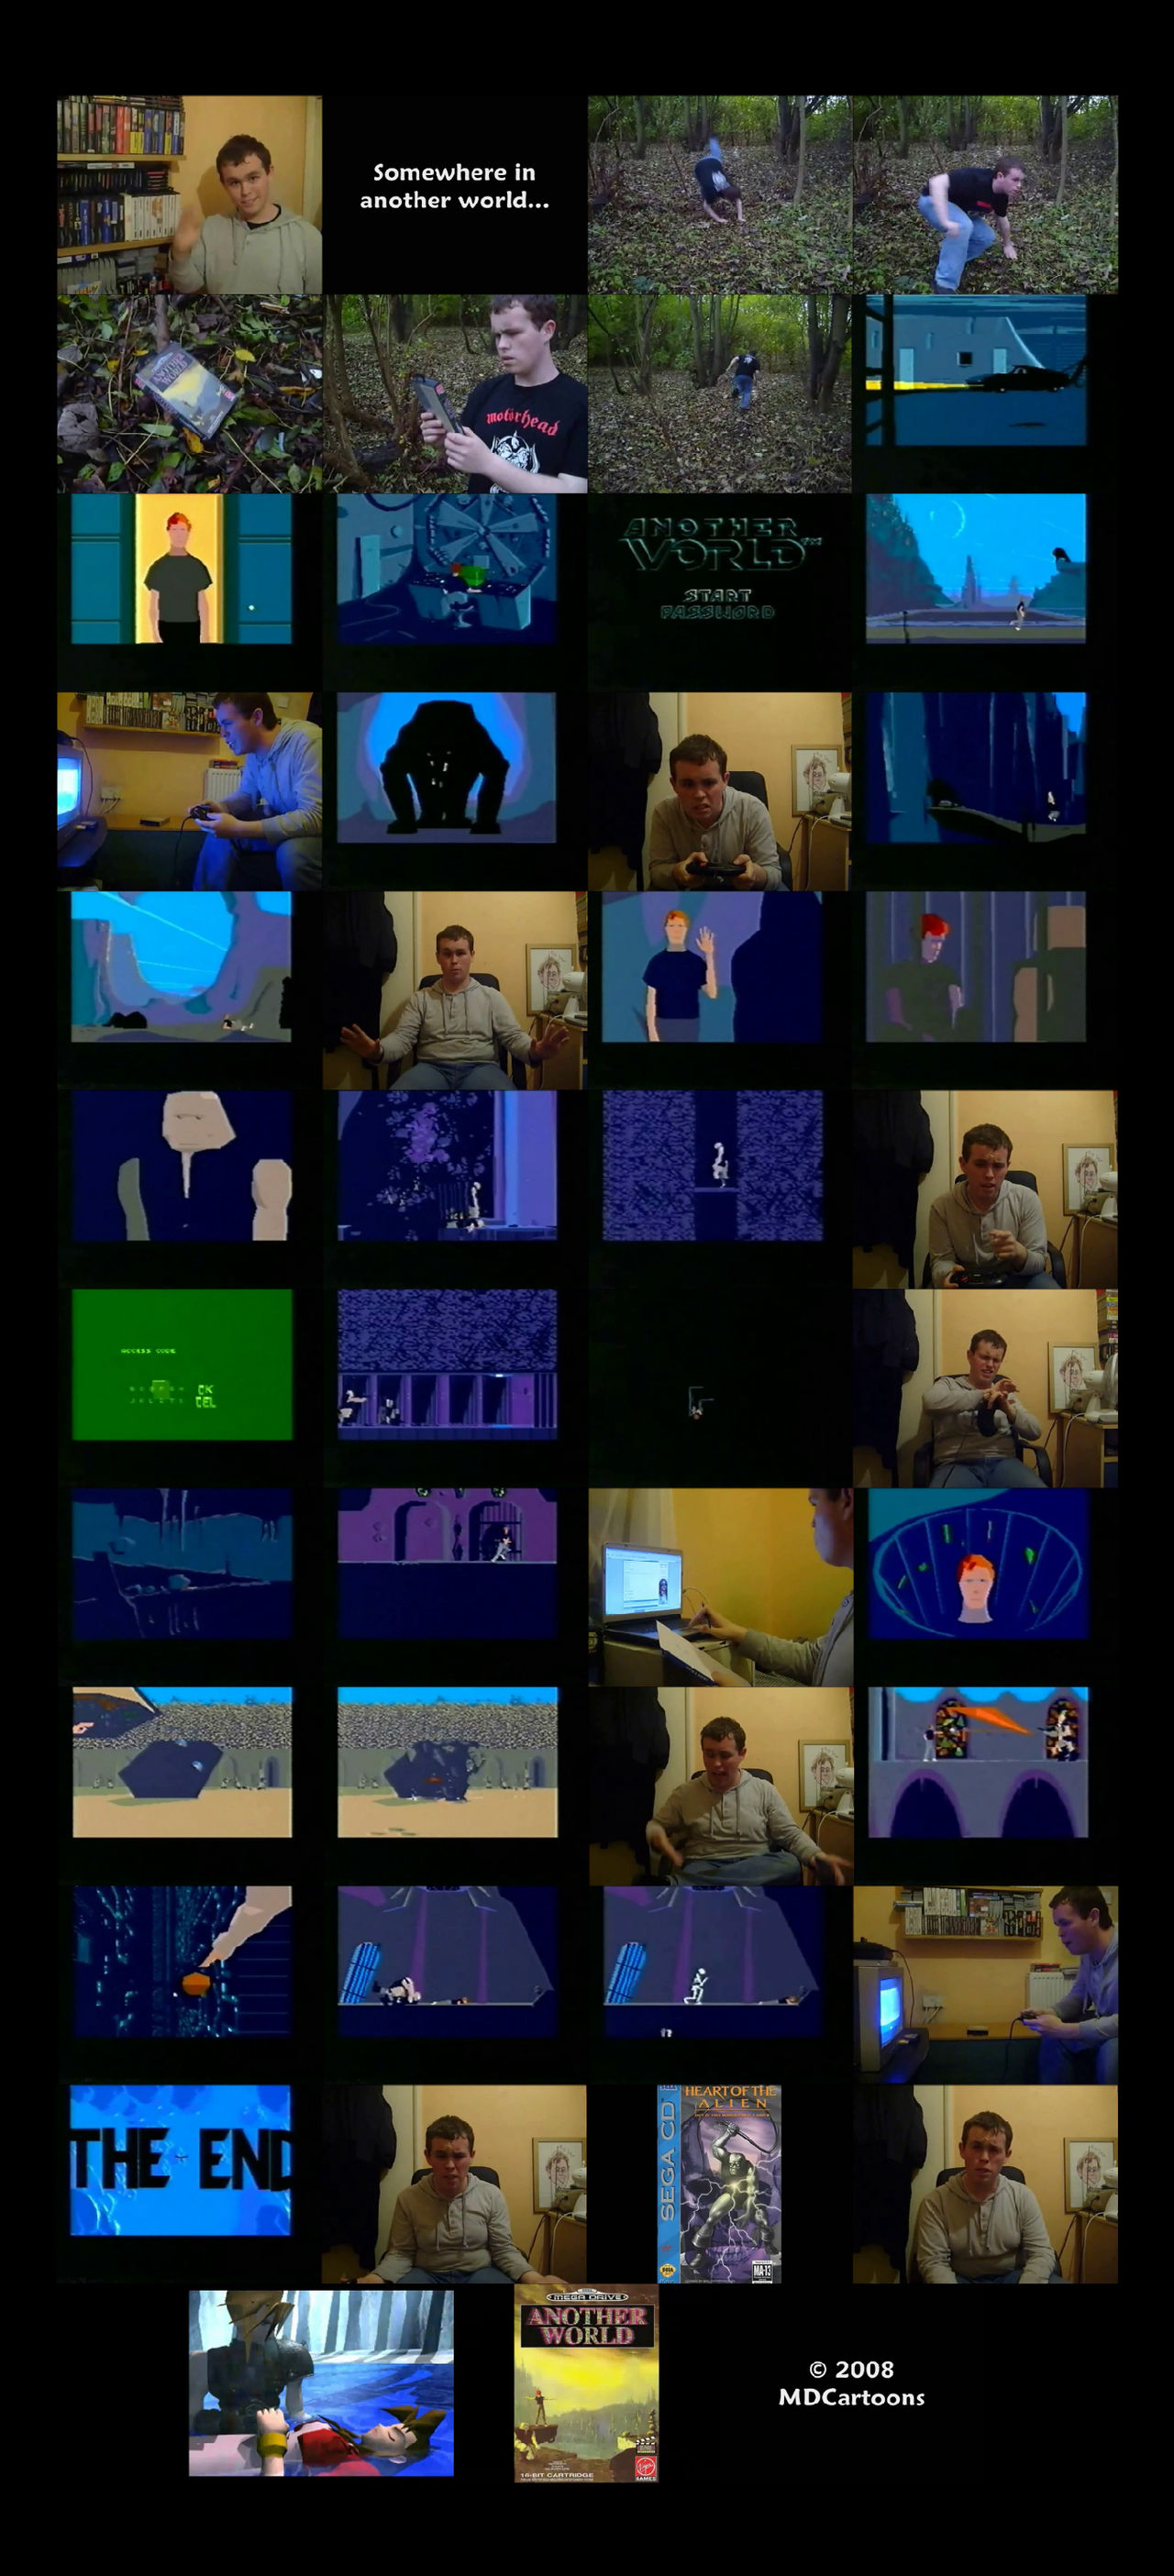 VGRetro - 06 - Another World Tele-Snaps